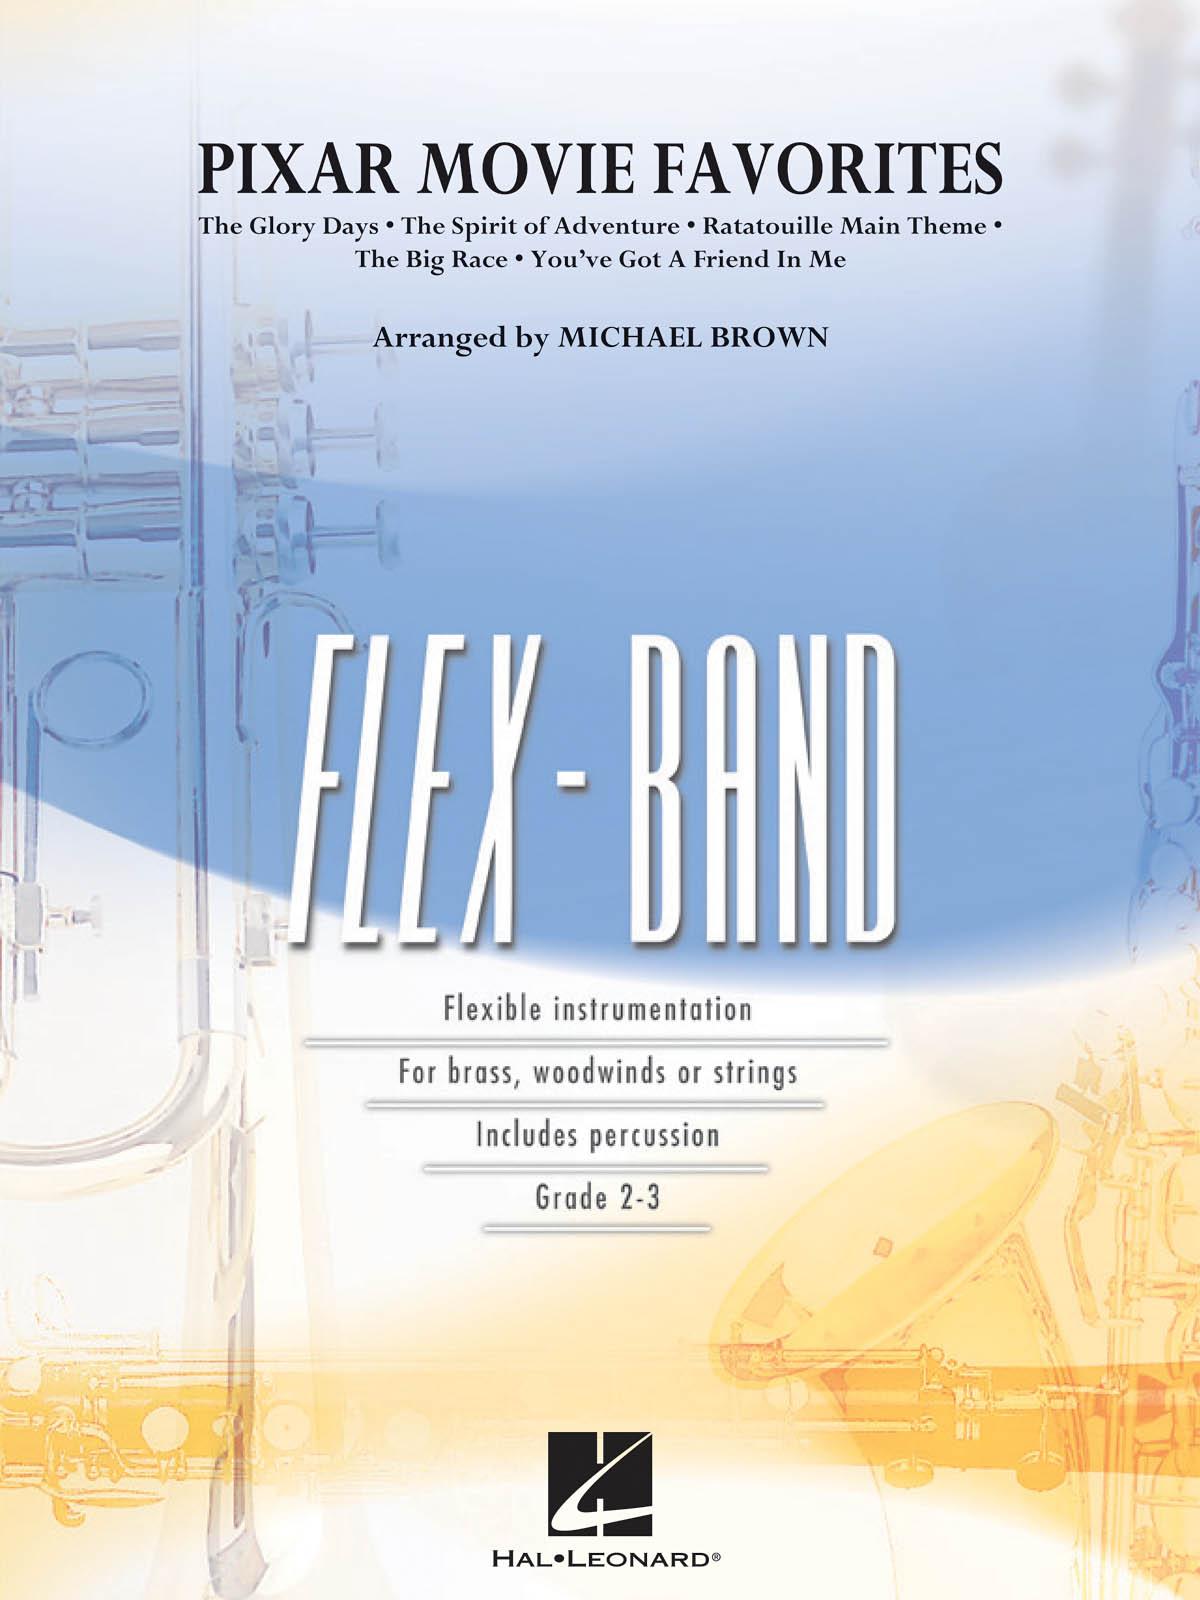 Pixar Movie Favorites: Concert Band: Score & Parts